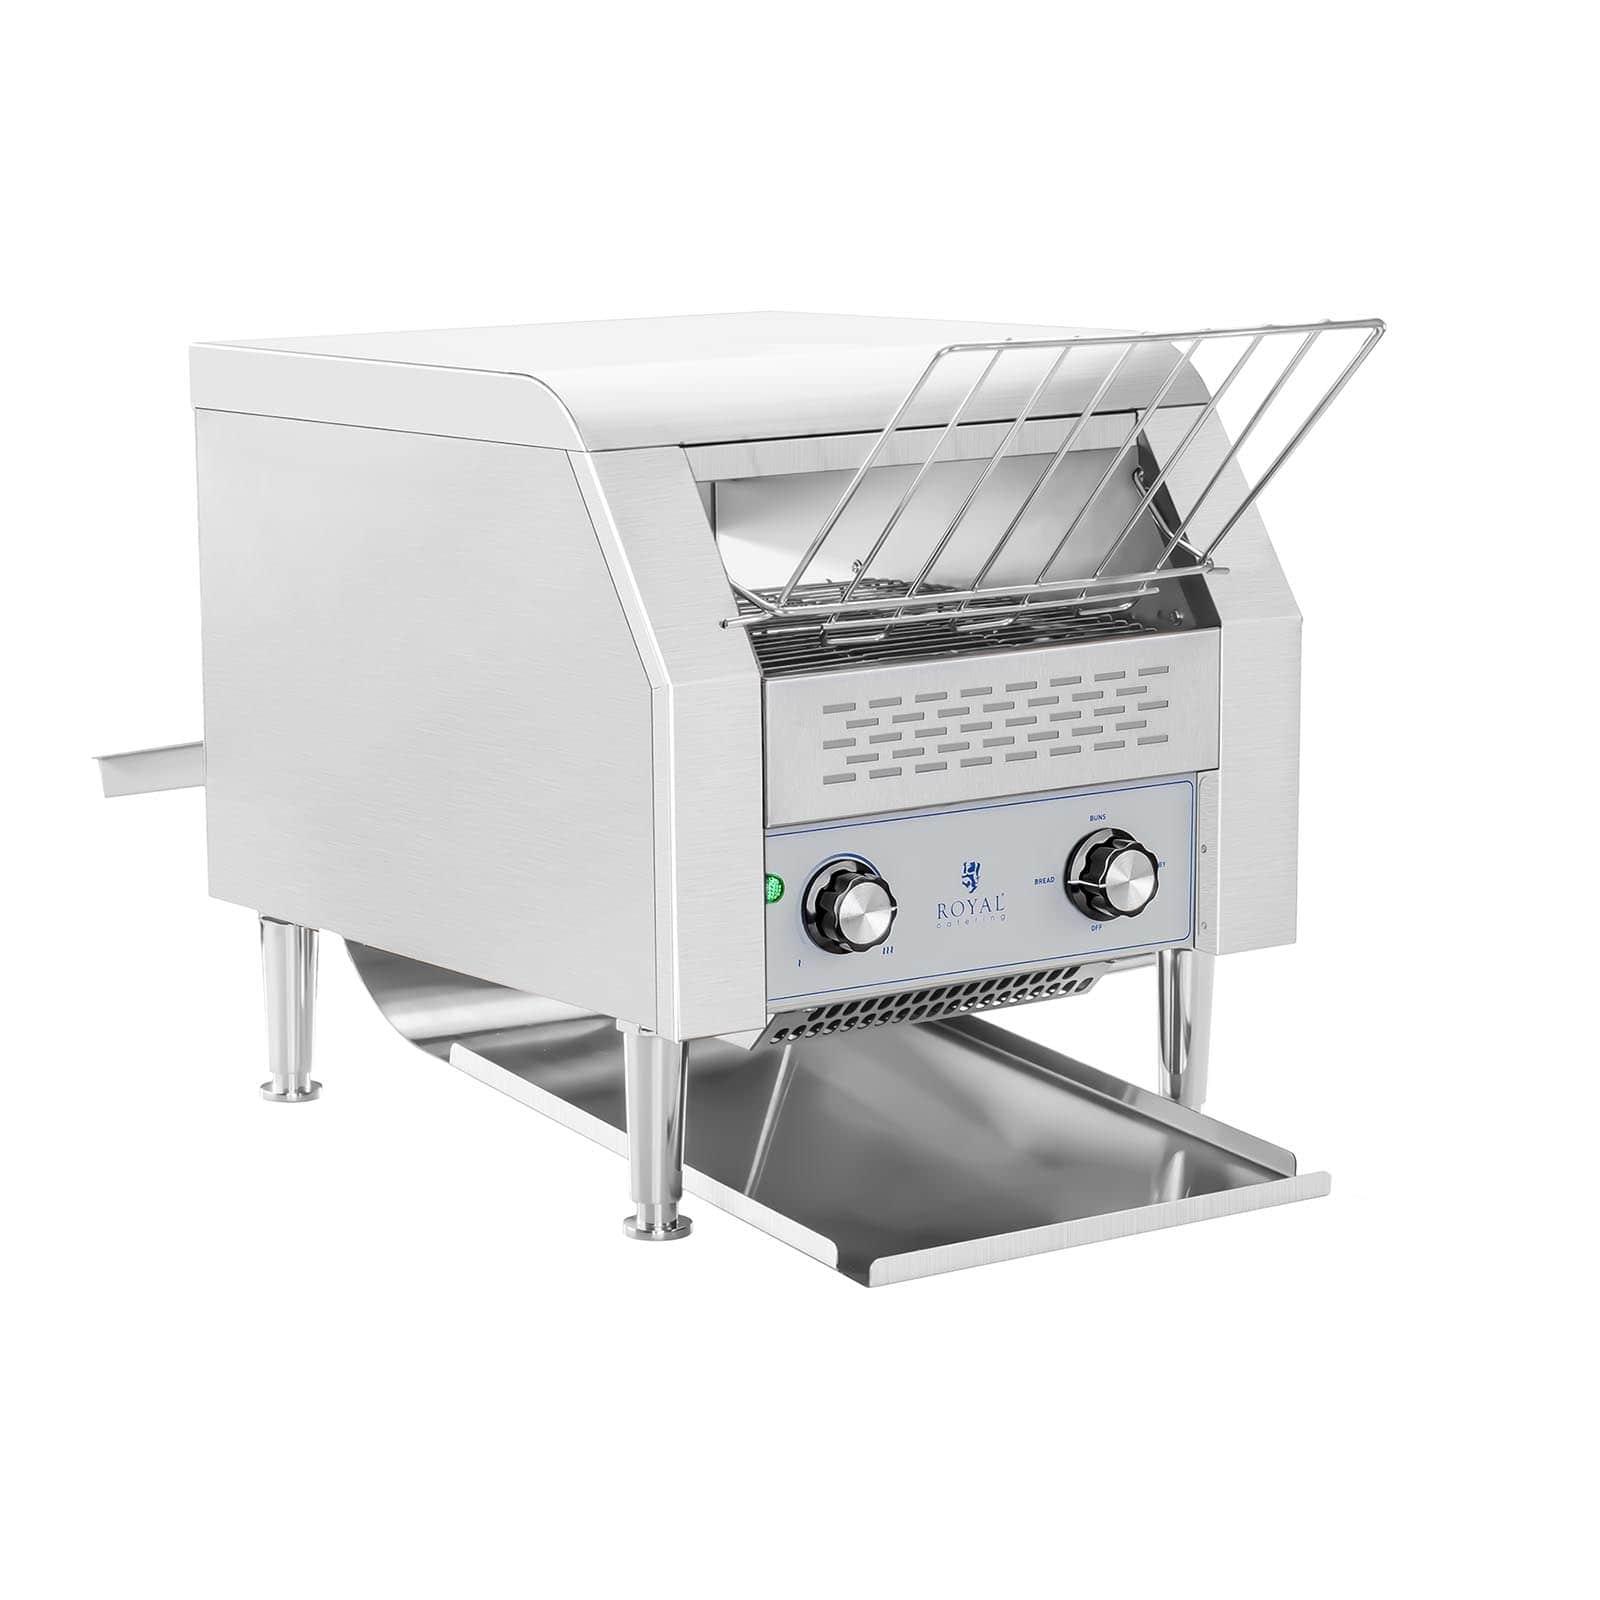 Gastro-Toaster